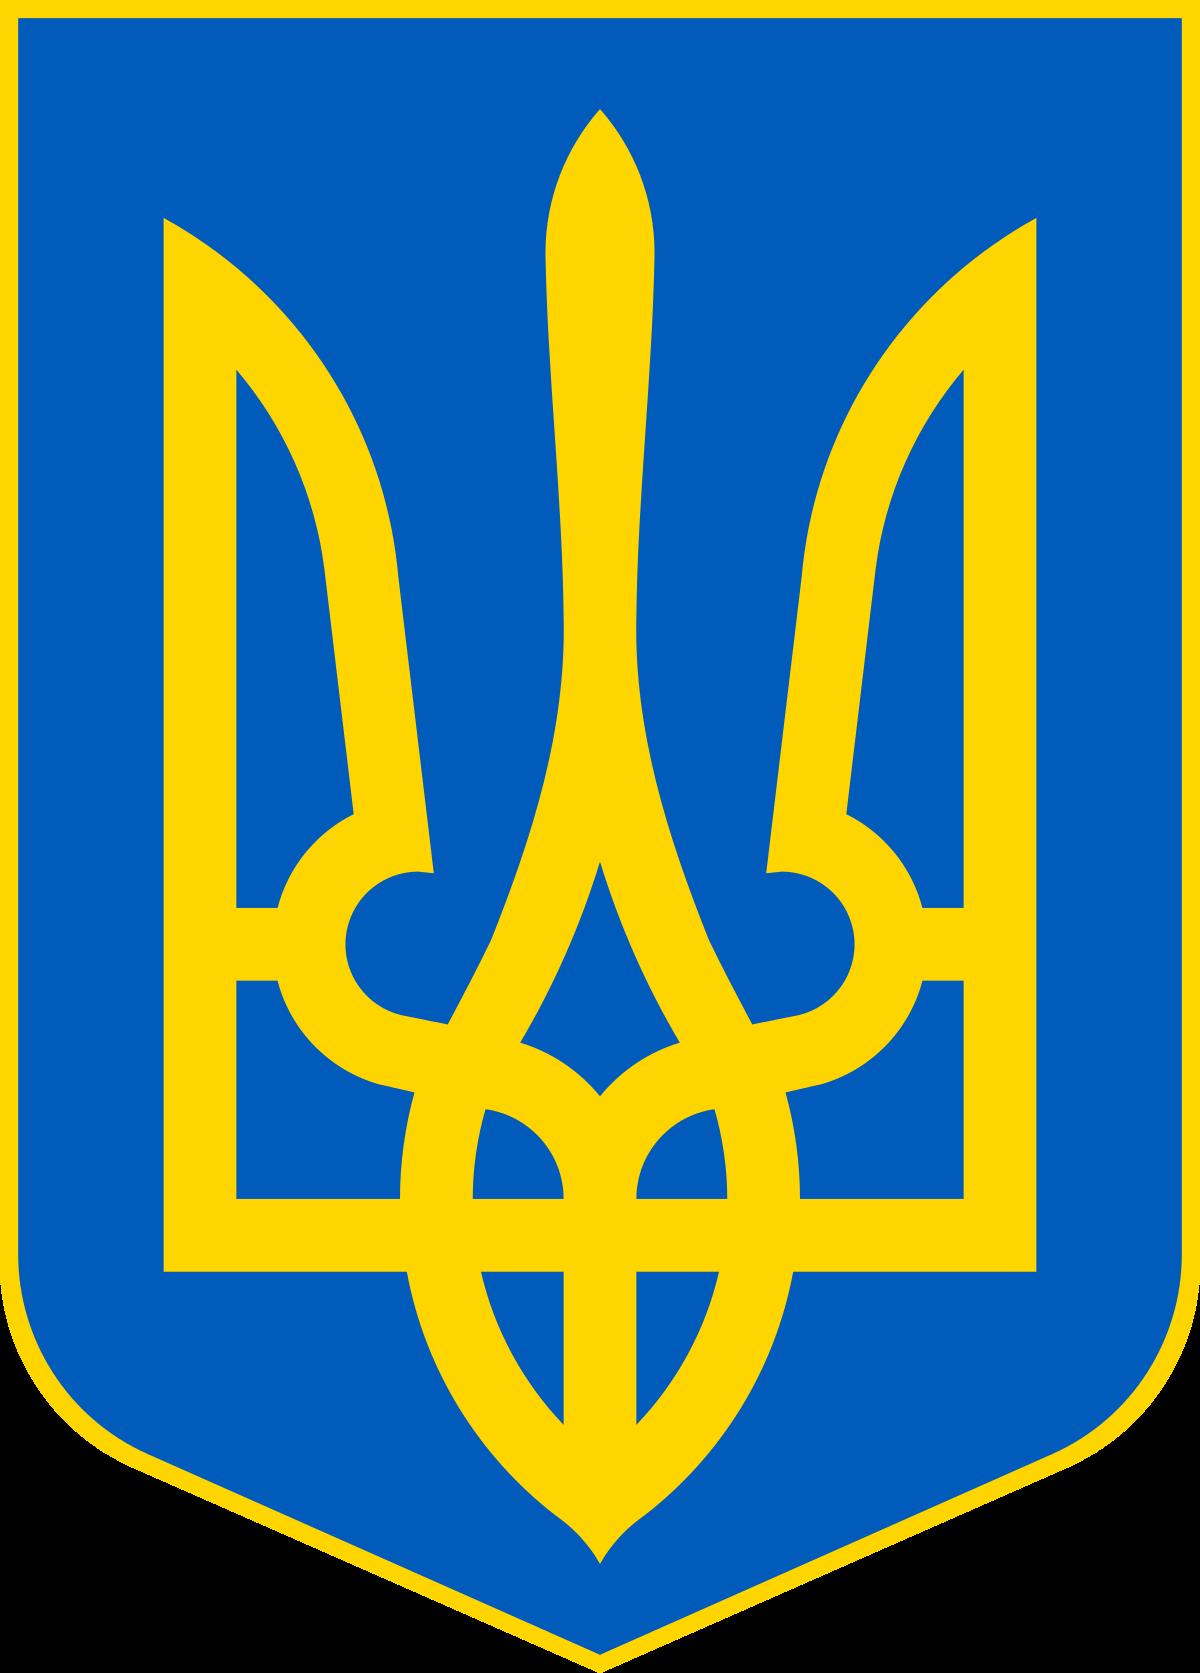 Coat of arms of Ukraine   Wikipedia 1200x1673